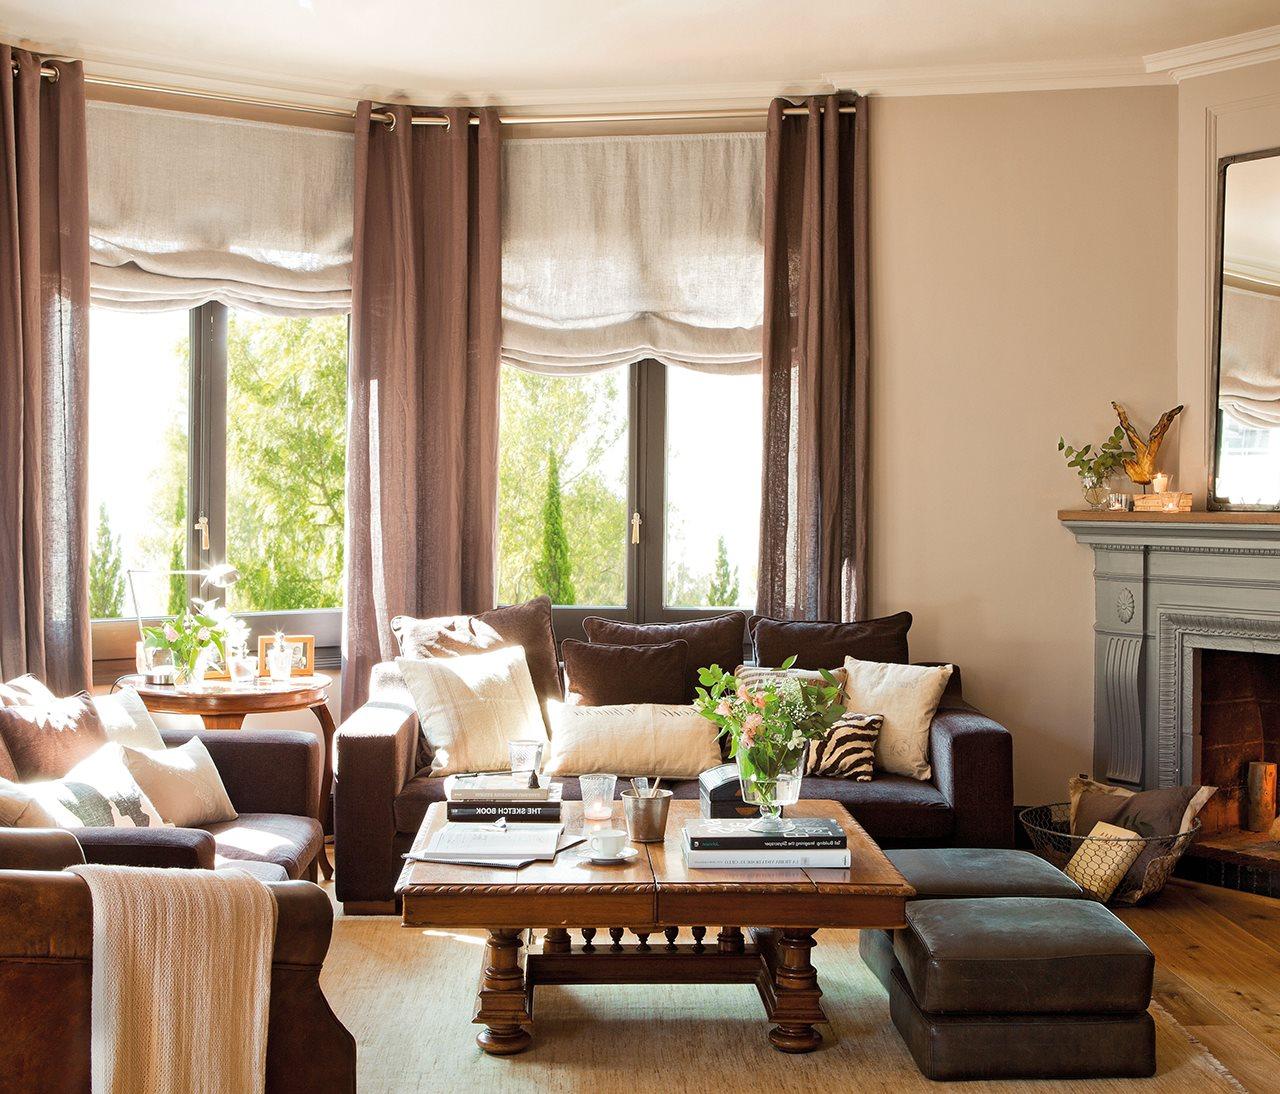 saln con doble ventanal sofs grises y chimenea qu cortinas pongo